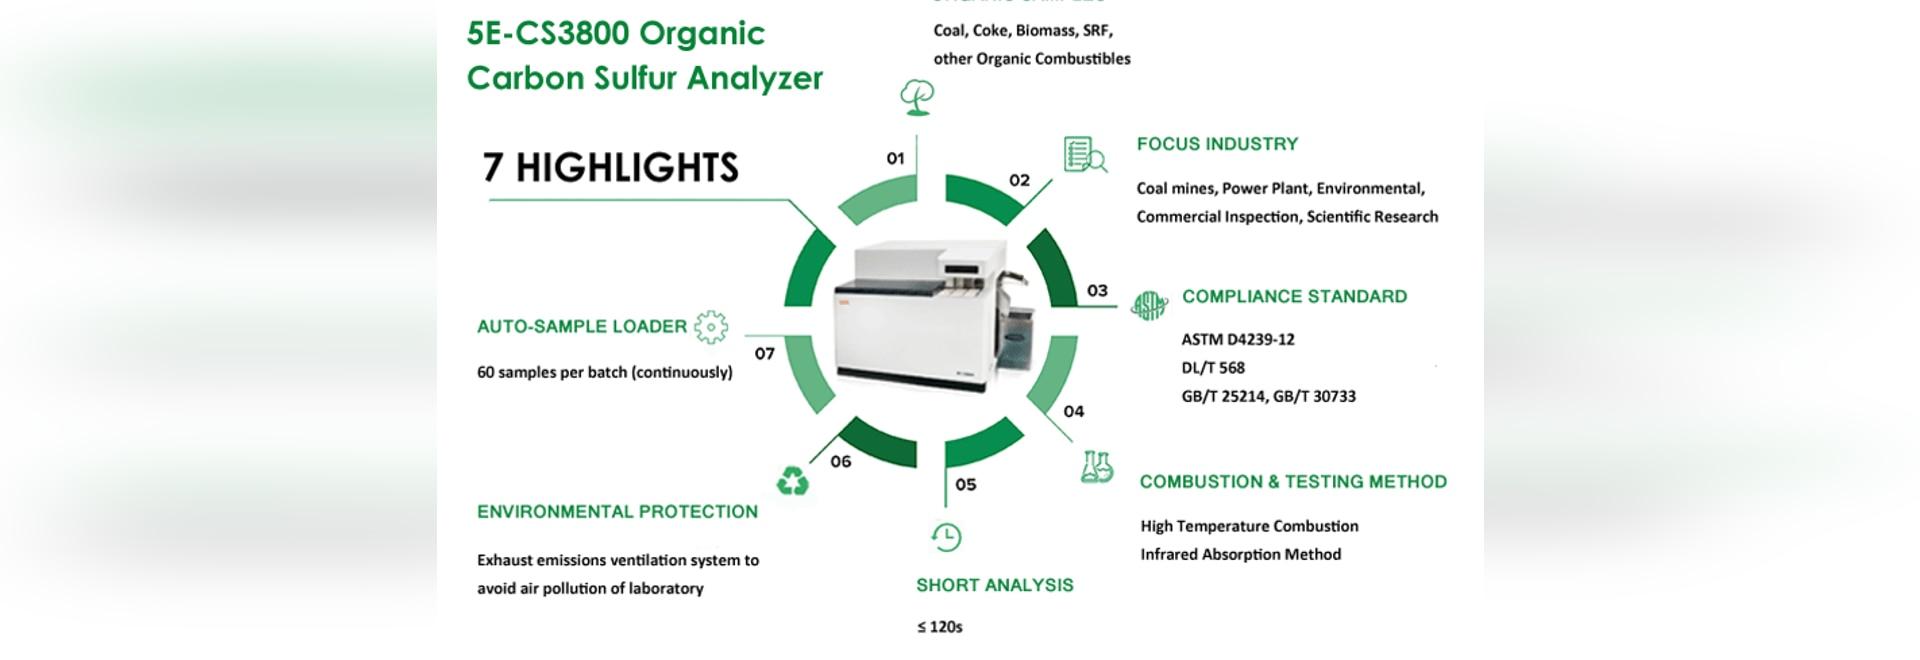 5E-CS3800 Automatic Organic Sulfur Carbon Analyzer